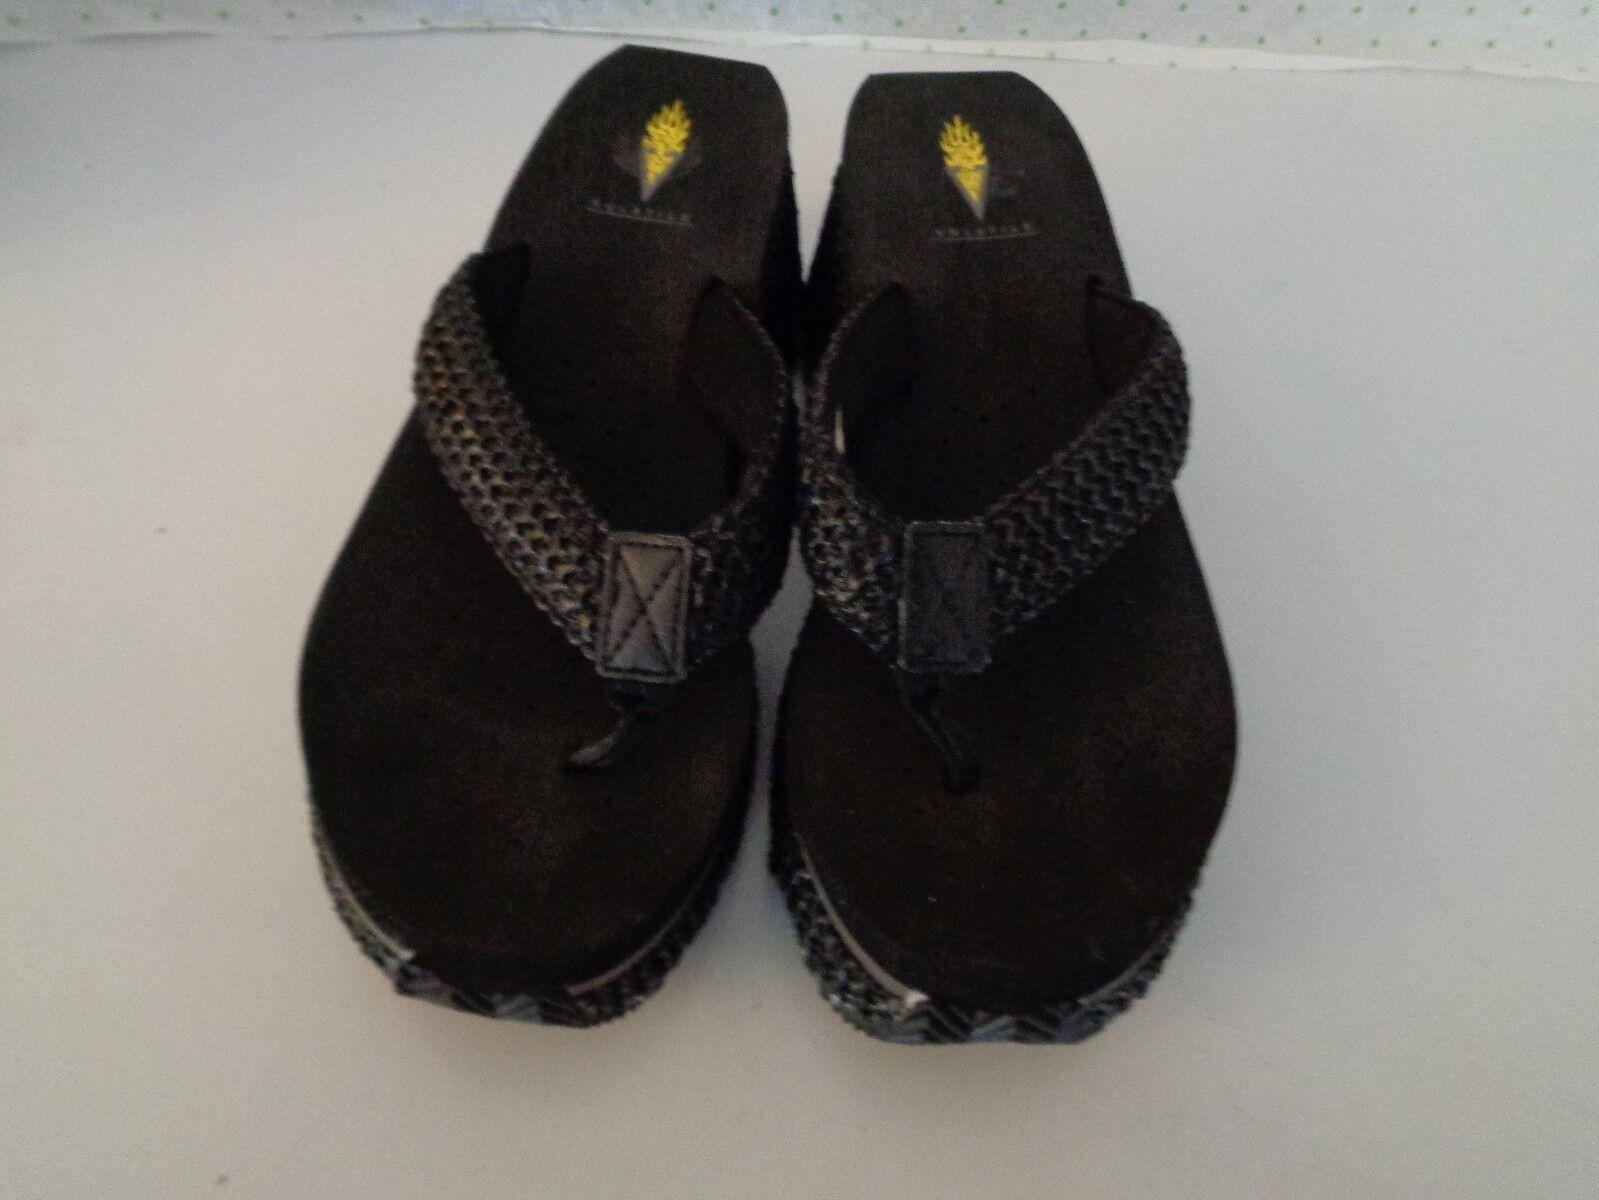 Volatile Women's Slides Black weave Platform Wedge Slides Women's Size 9 US--CLEAN 2a2b7f